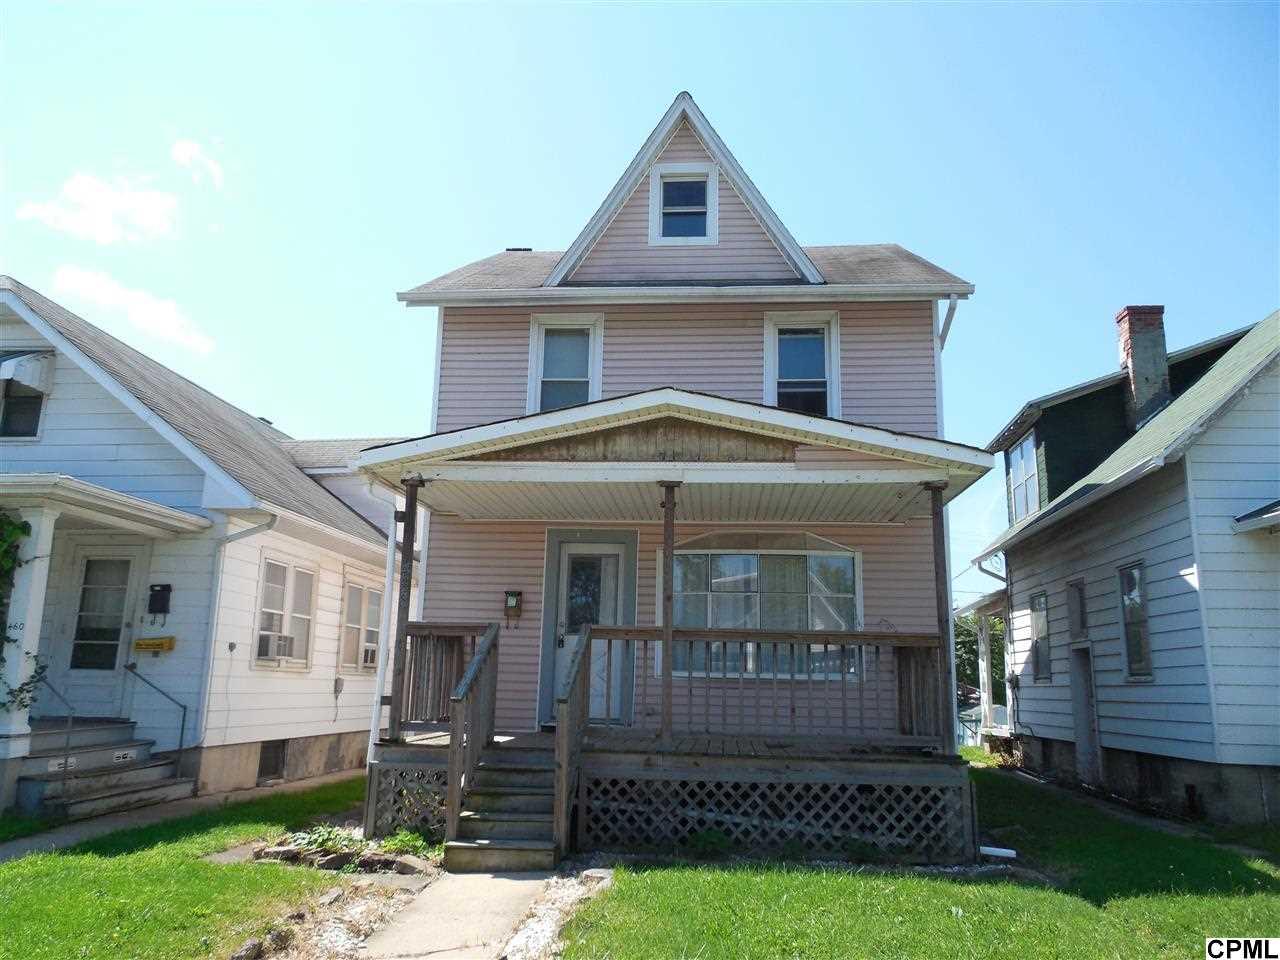 458 S Juniata St, Lewistown, PA 17044